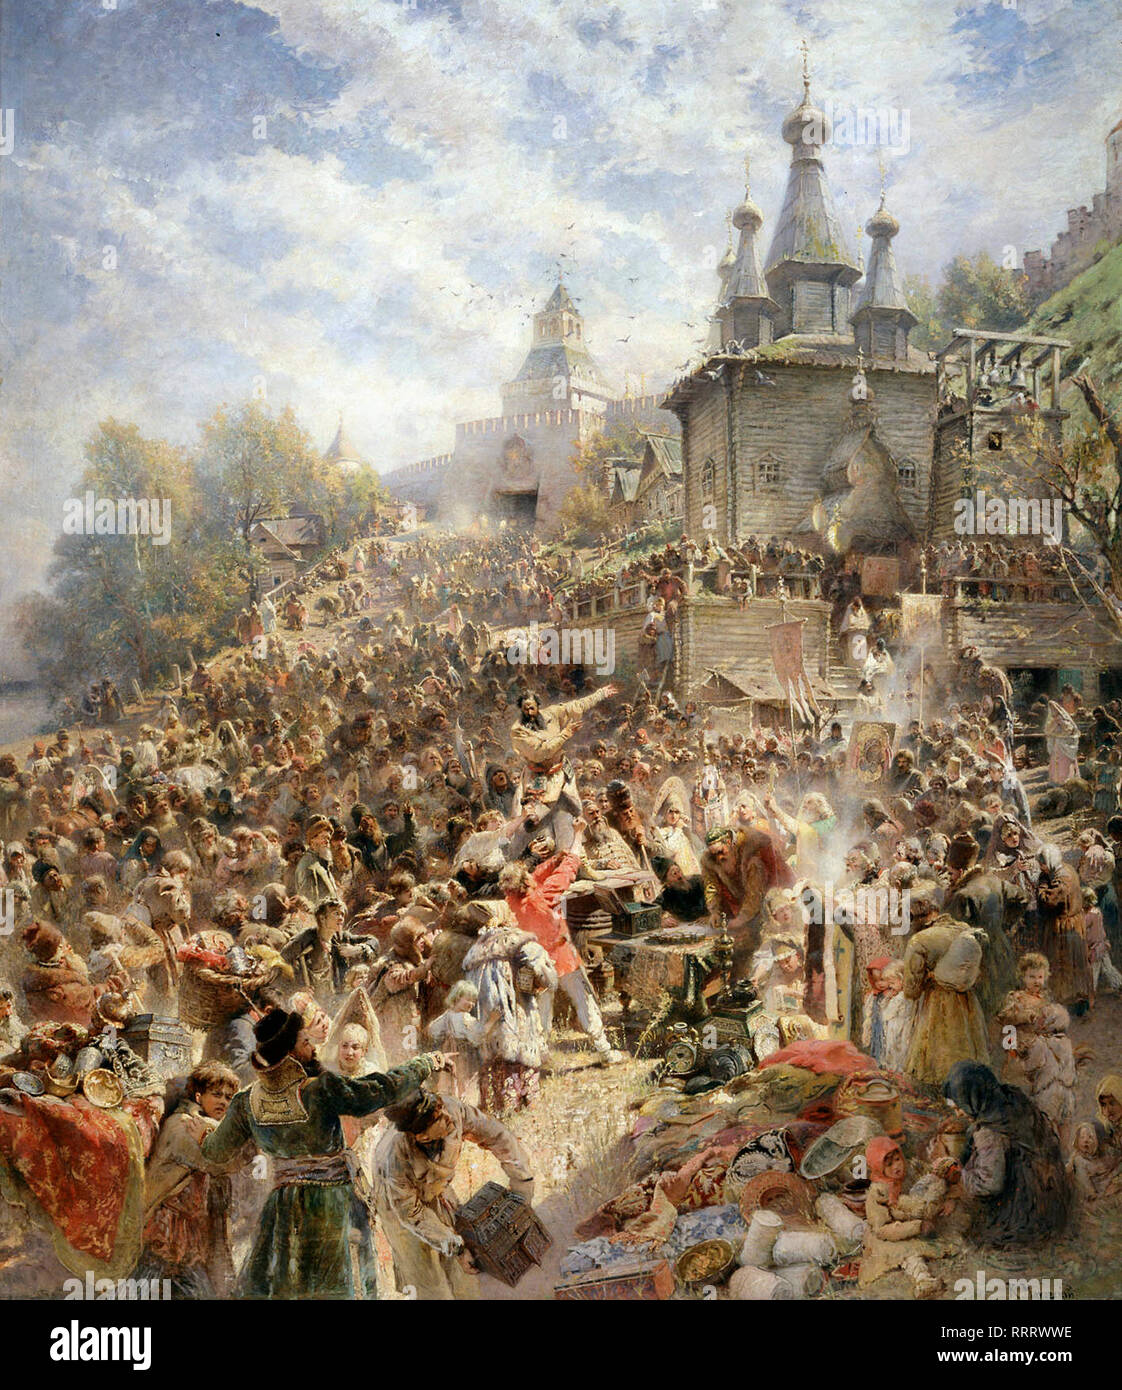 Appeal of Minin - Konstantin Makovsky, 1896 - Stock Image